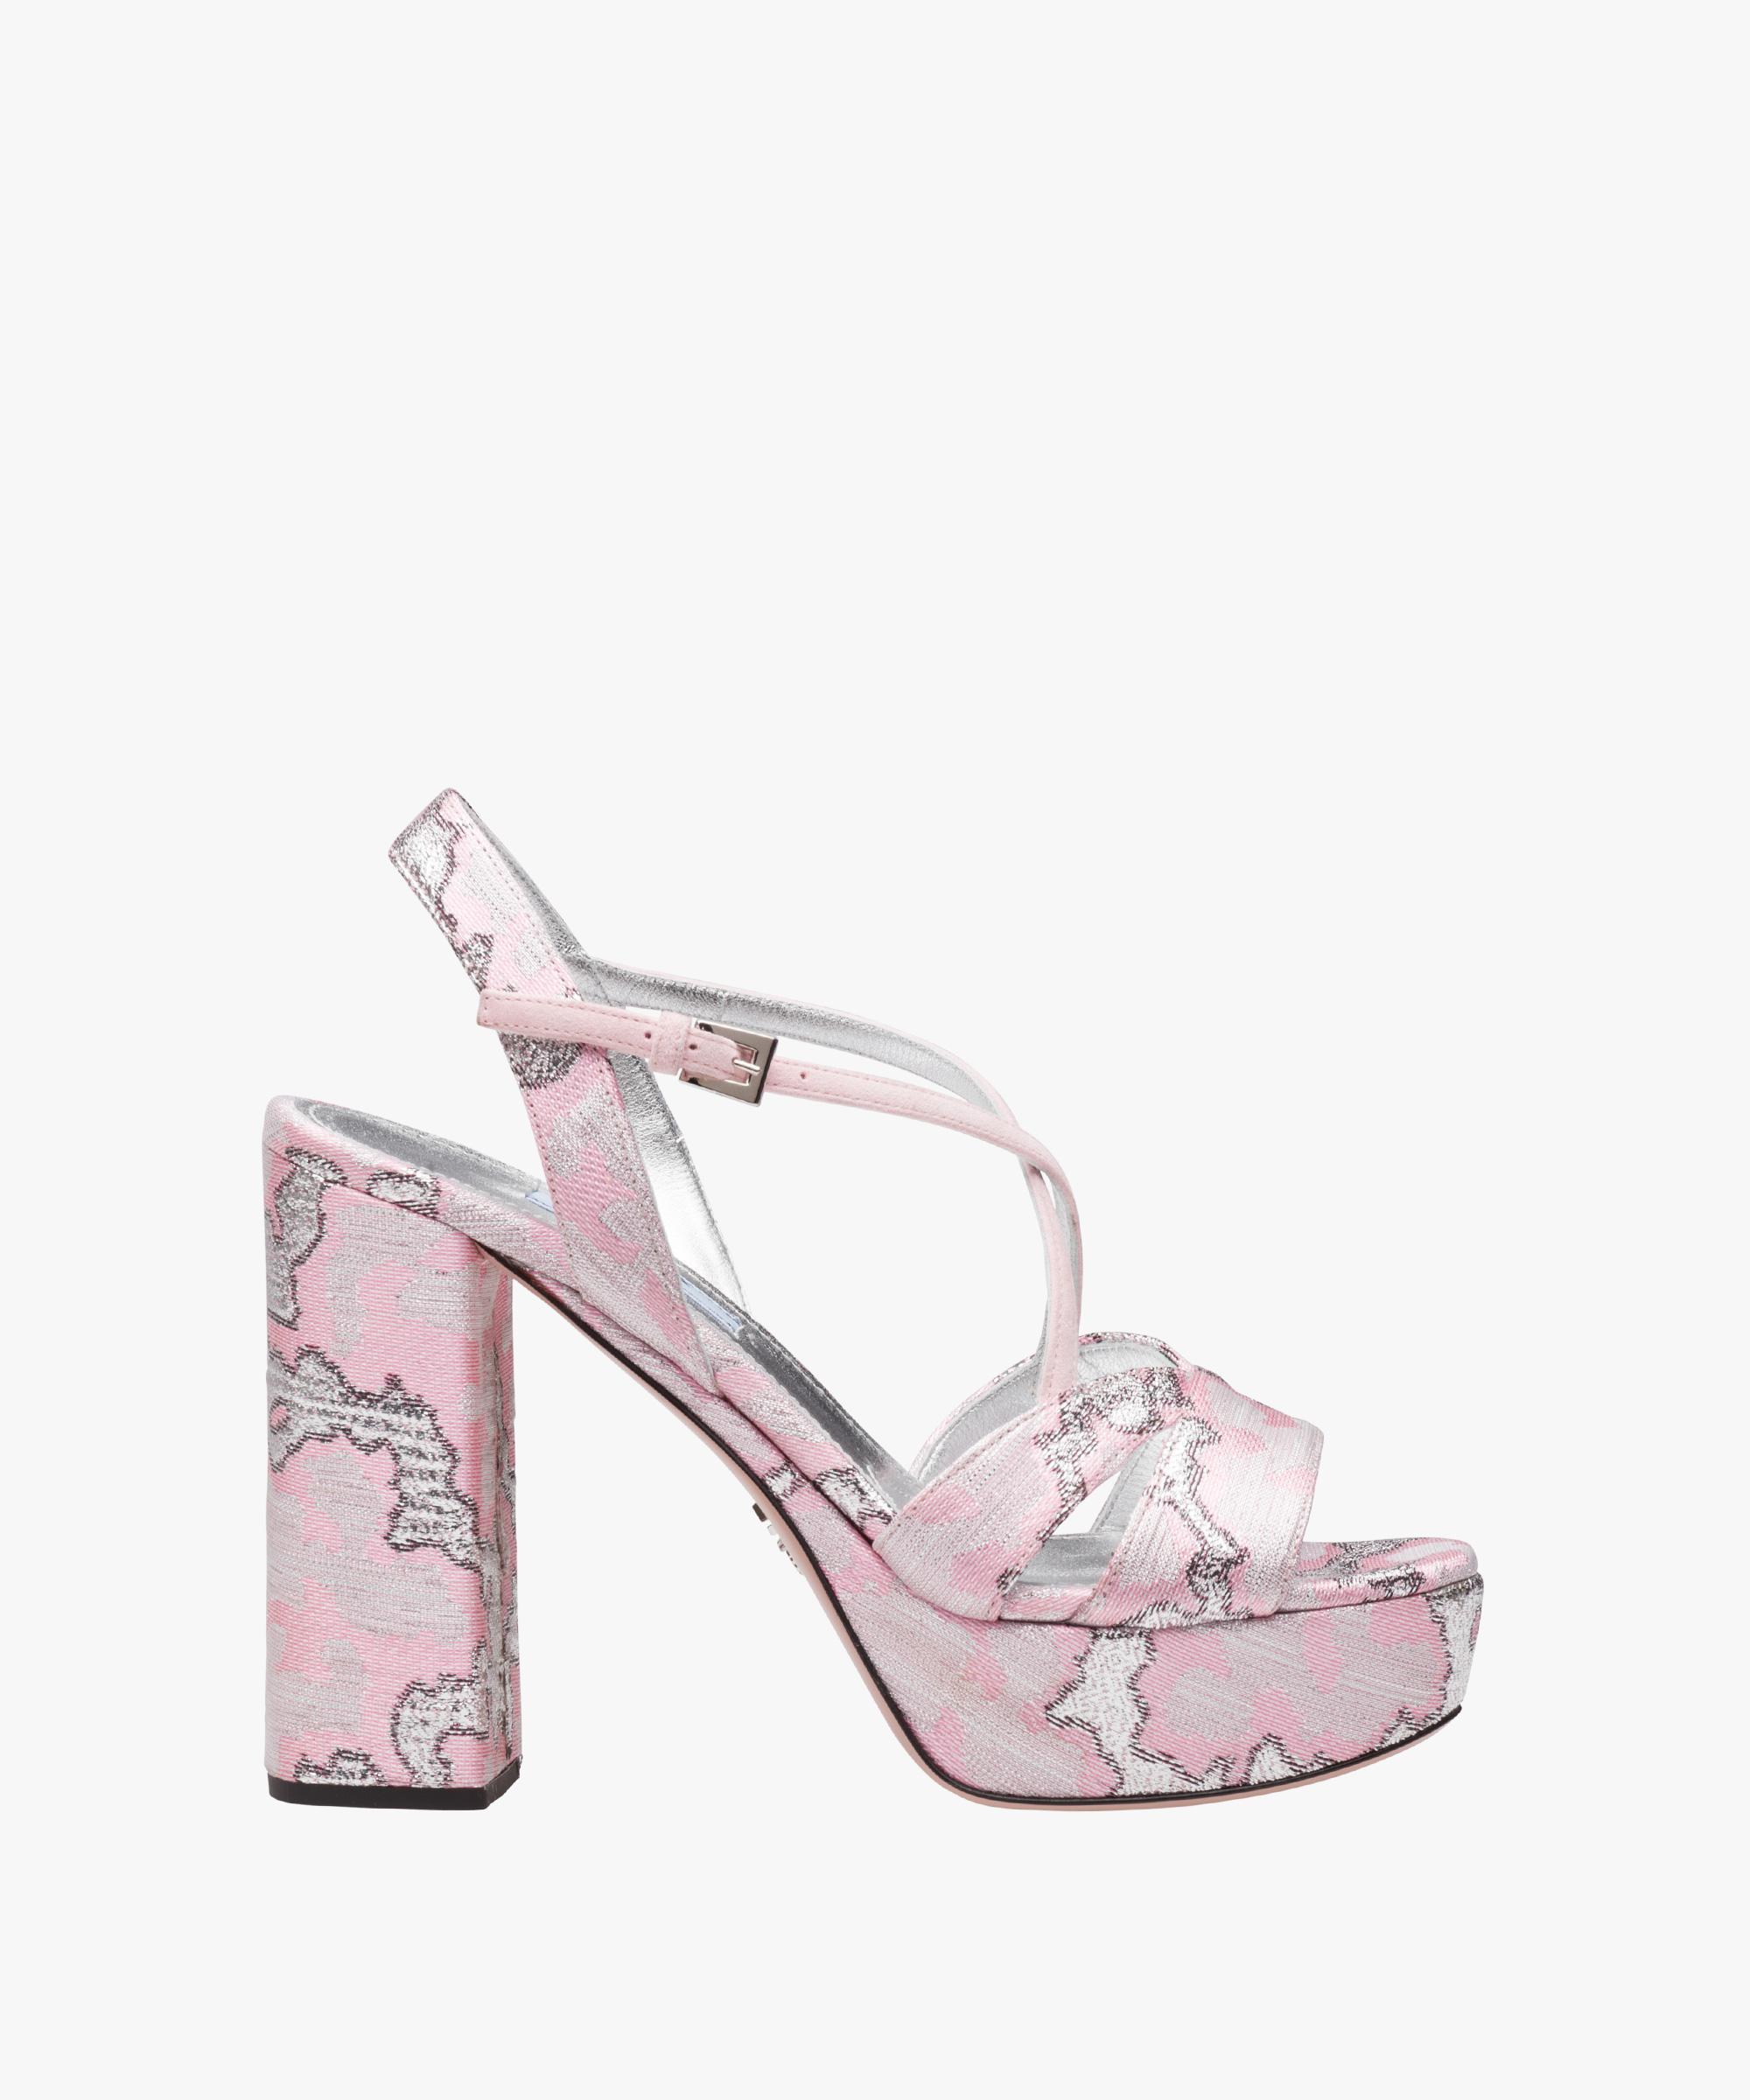 99a213c94d5 Lyst - Prada Lurex Jacquard Platform Sandals in Pink